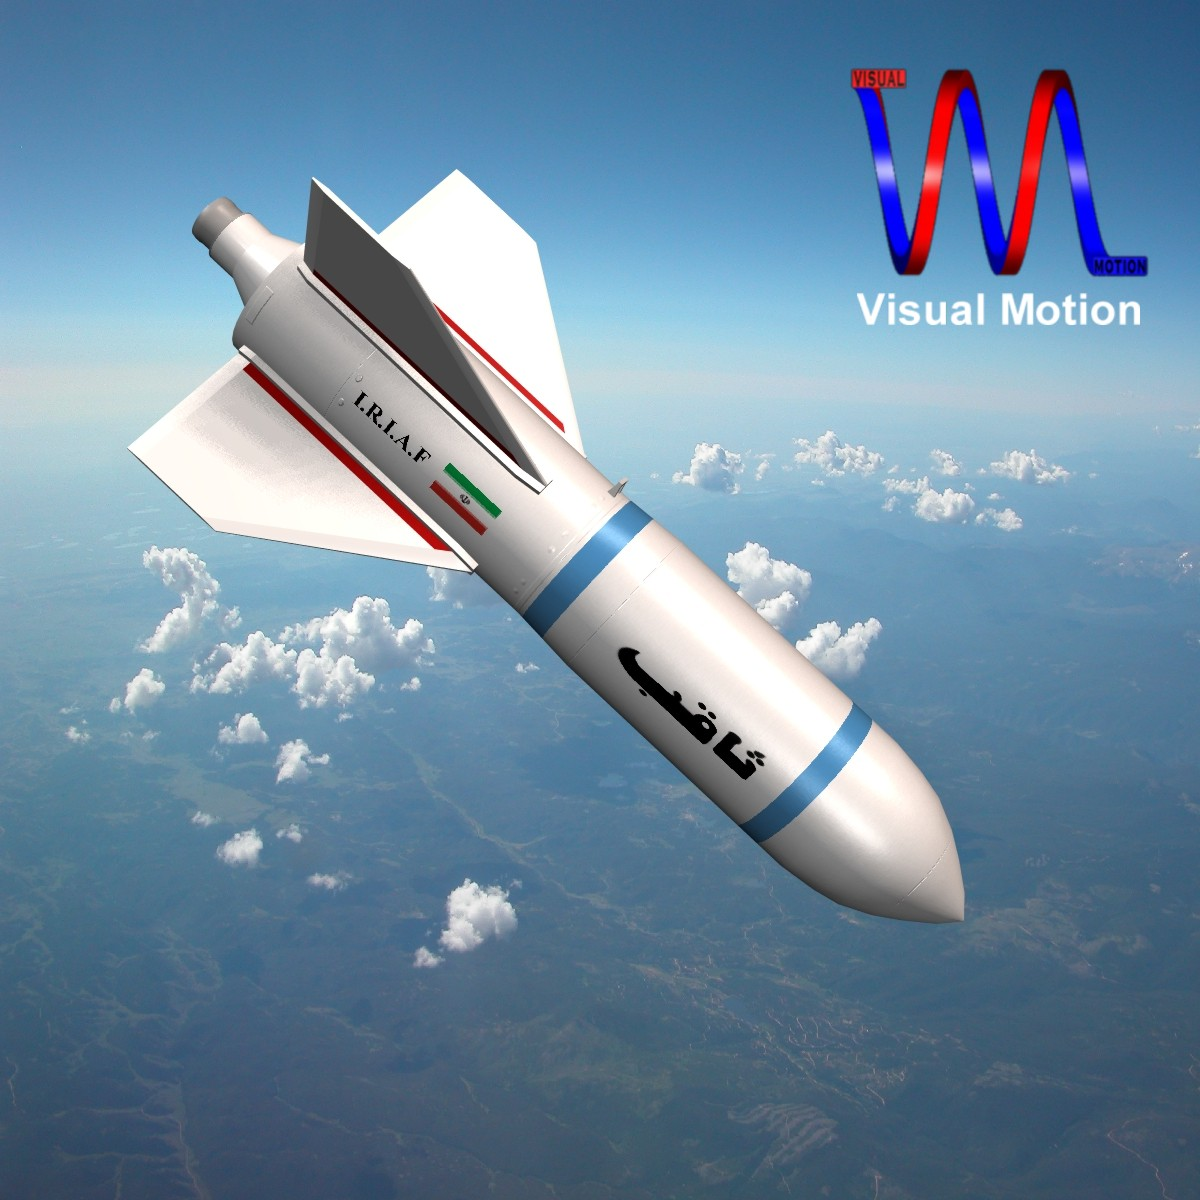 iráni sagheb bomba 3d modell 3ds dxf cob x objekt 150331